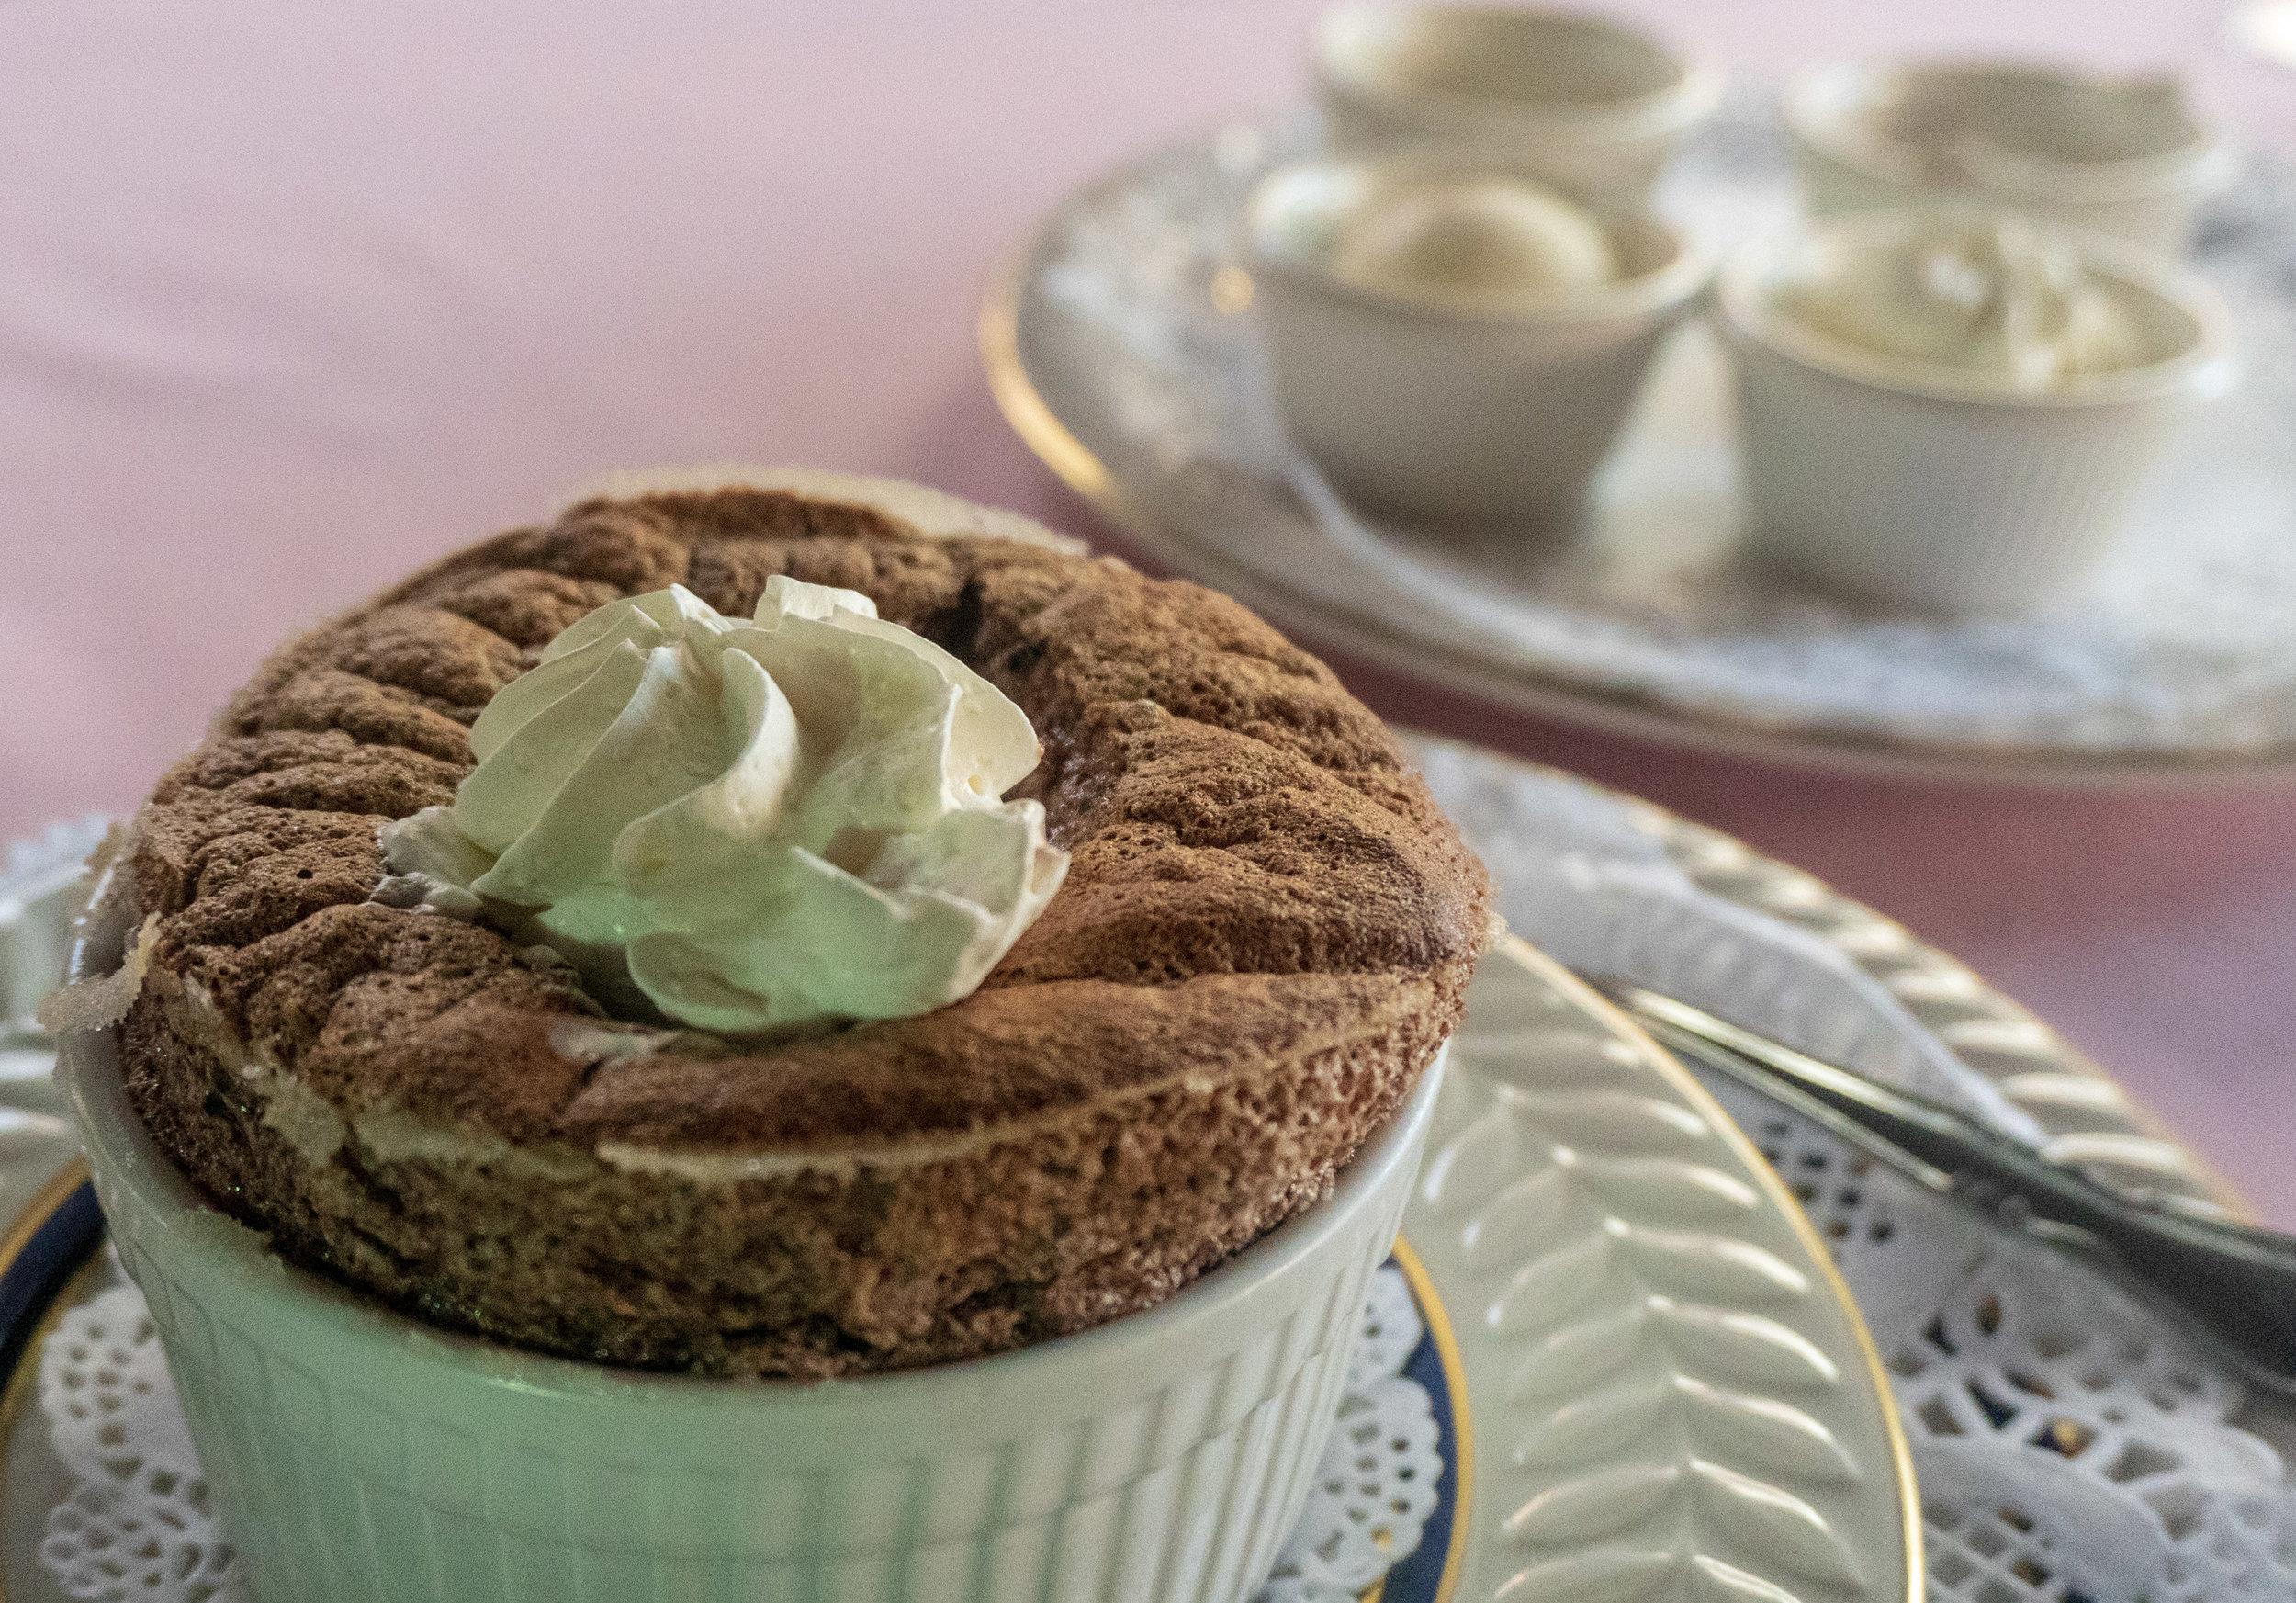 Chocolat Soufflé with House Vanilla Ice Cream & Chantilly